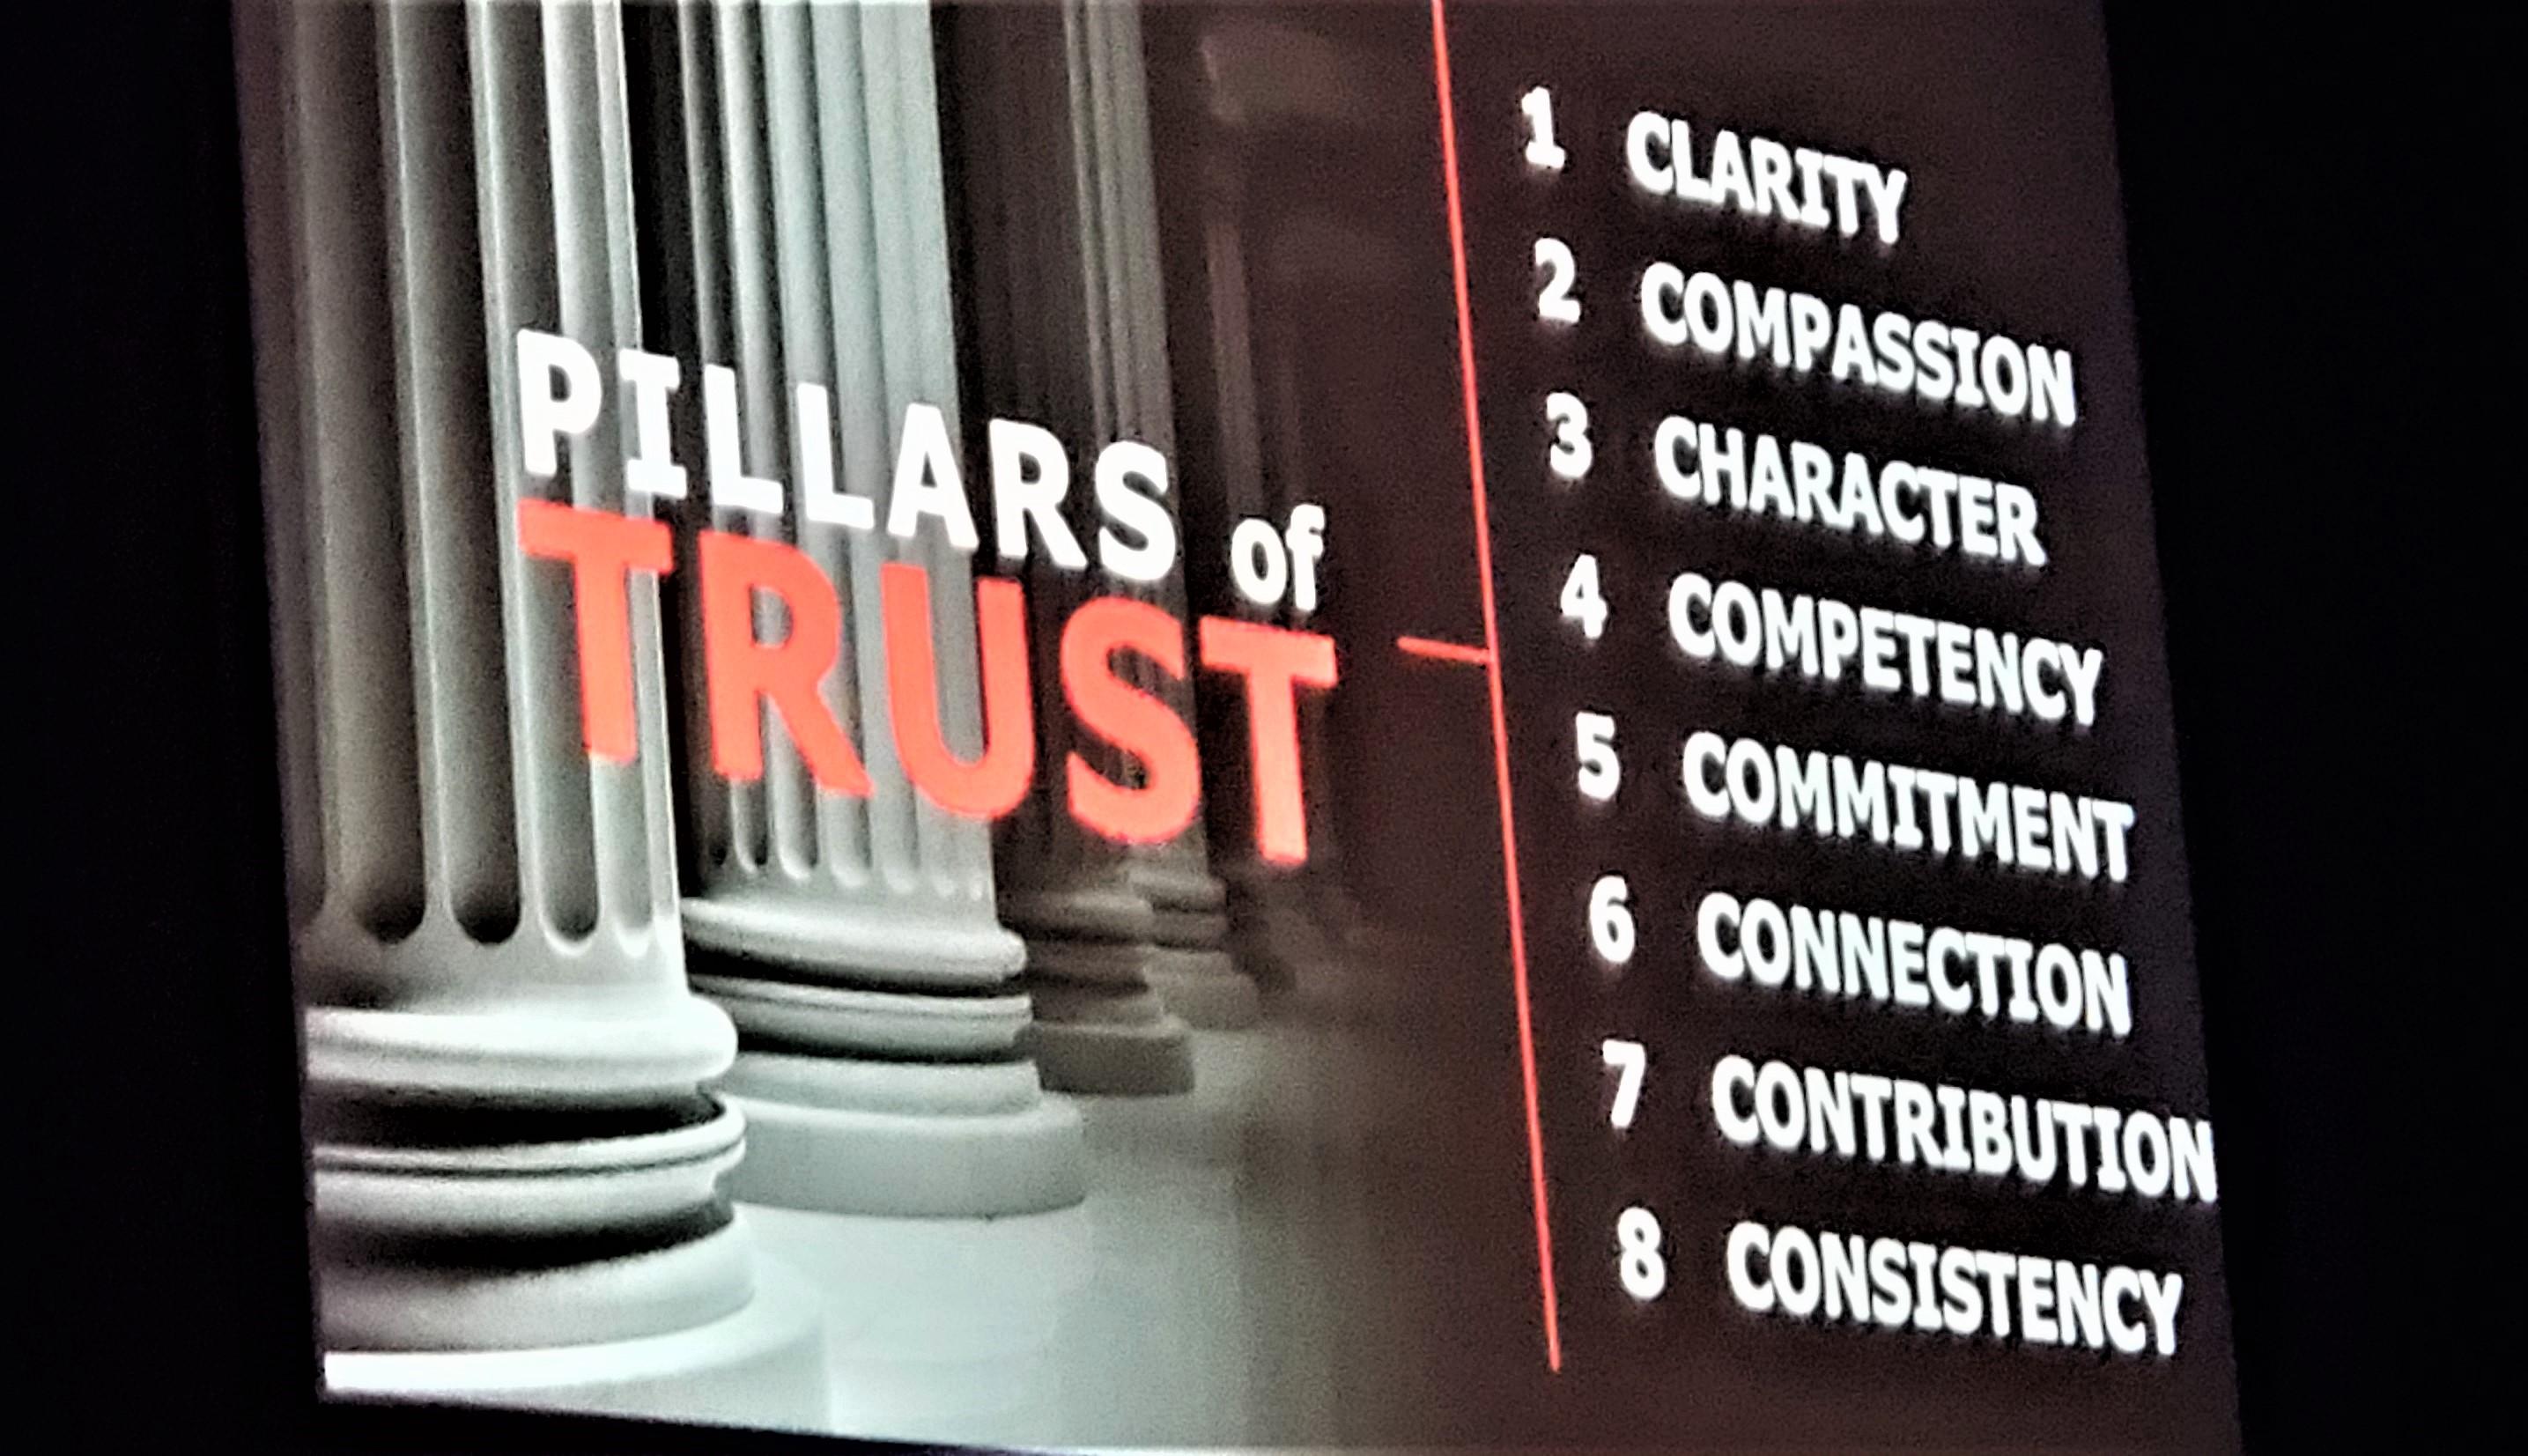 Pillars of Trust as presented by Global Trust Expert David Horsager.